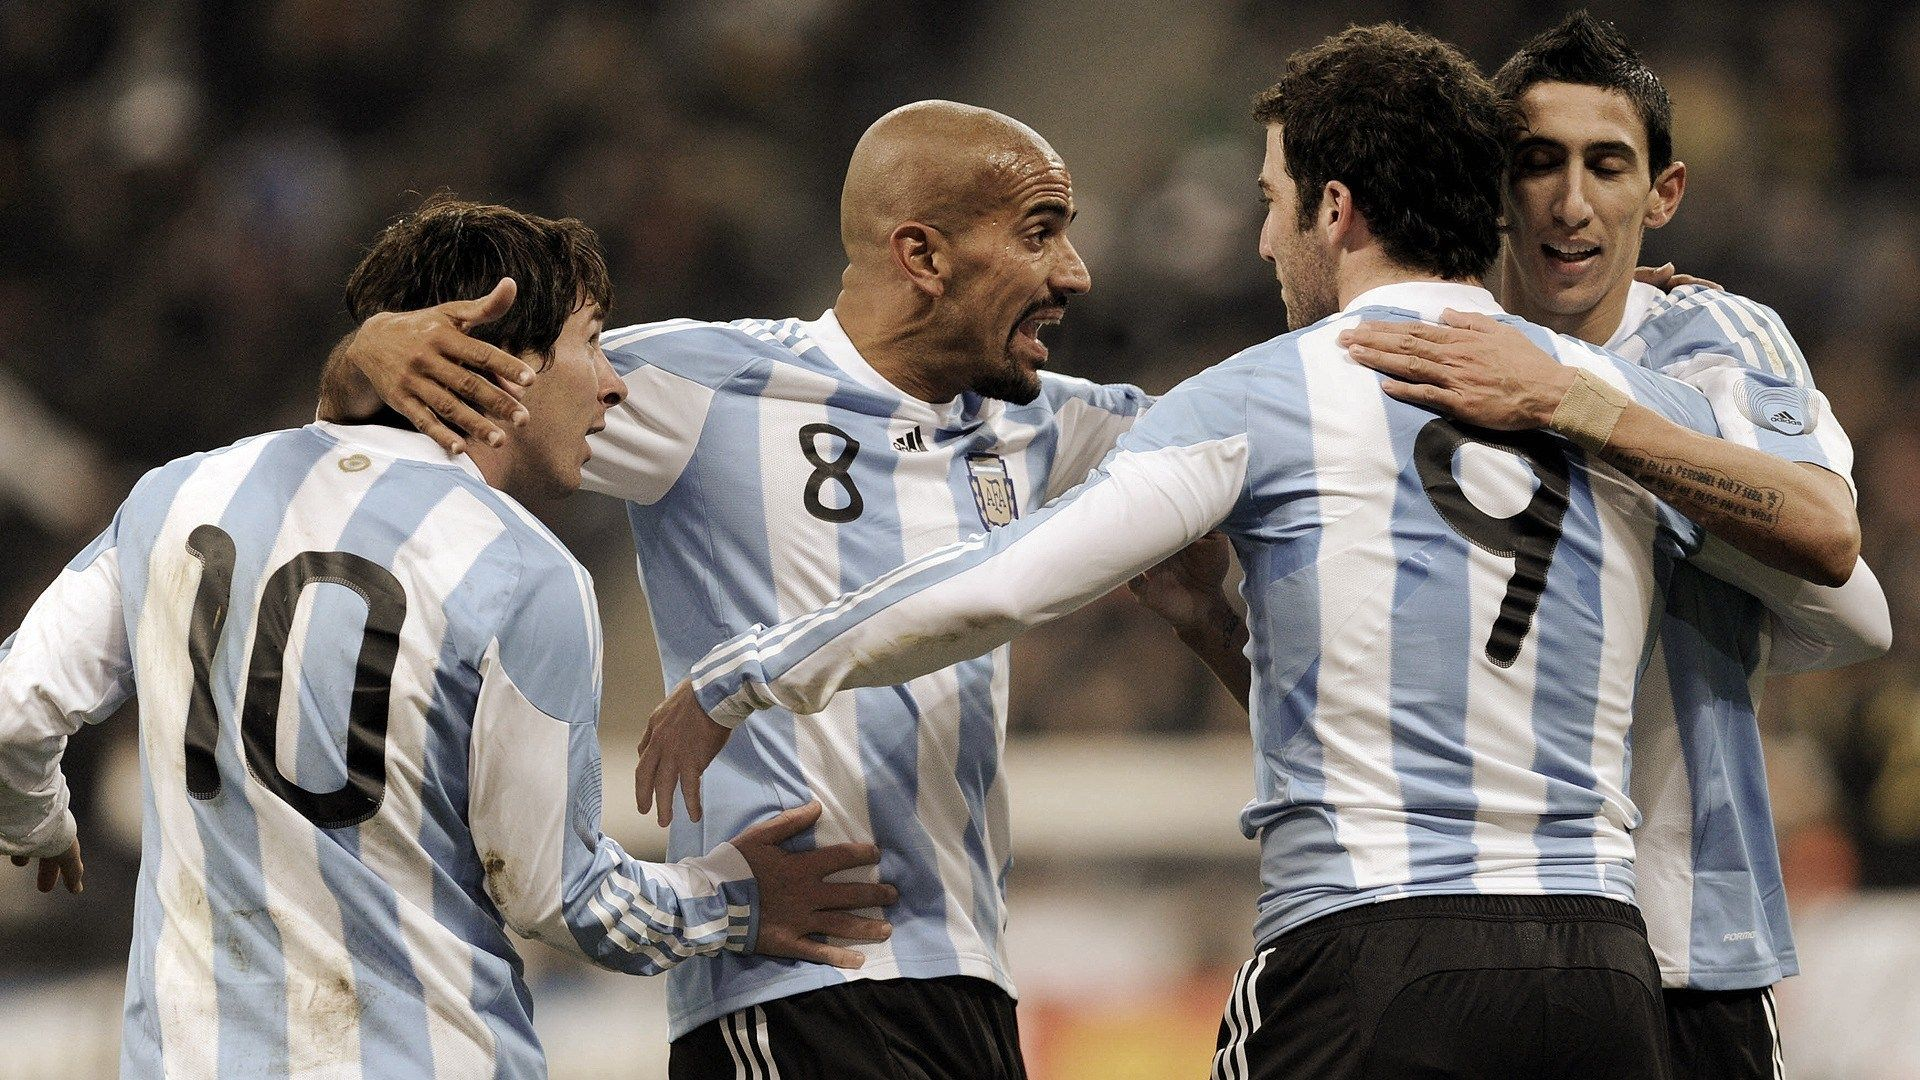 Argentina soccer background full hd sharovarka pinterest argentina soccer background full hd voltagebd Choice Image